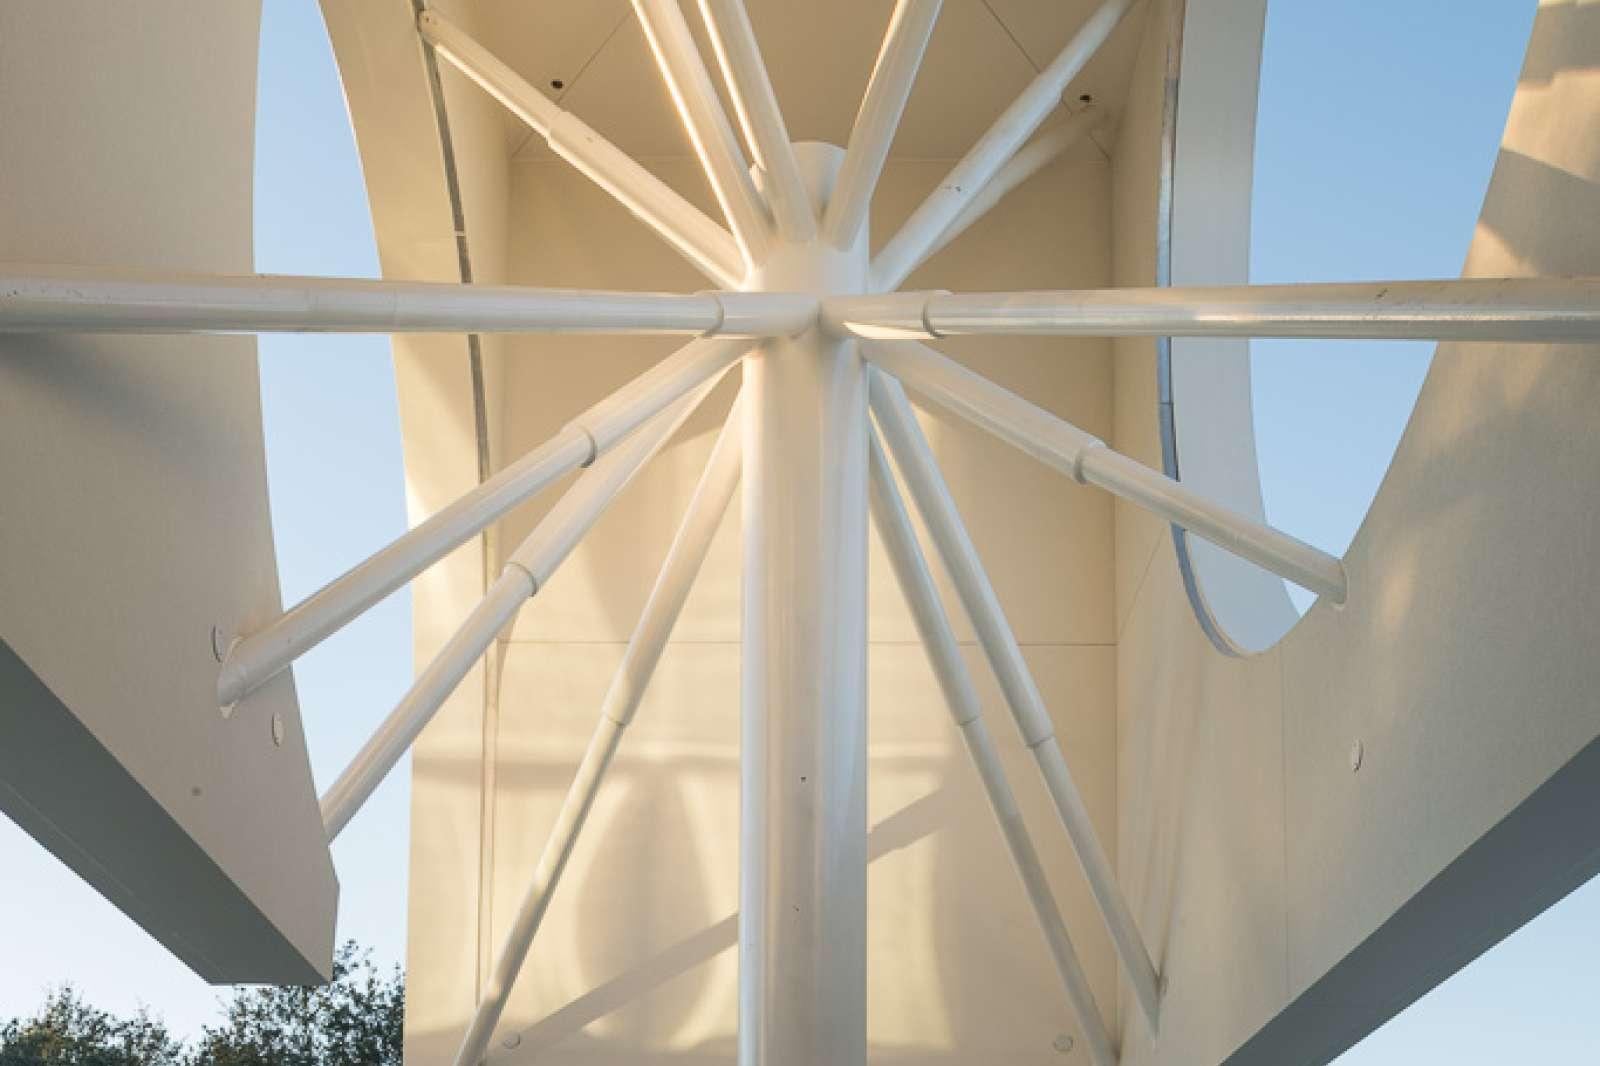 """Starburst column"" detail, Moody Center for the Arts at Rice University, January 2017. (Northwest corner) Photo: Nash Baker"